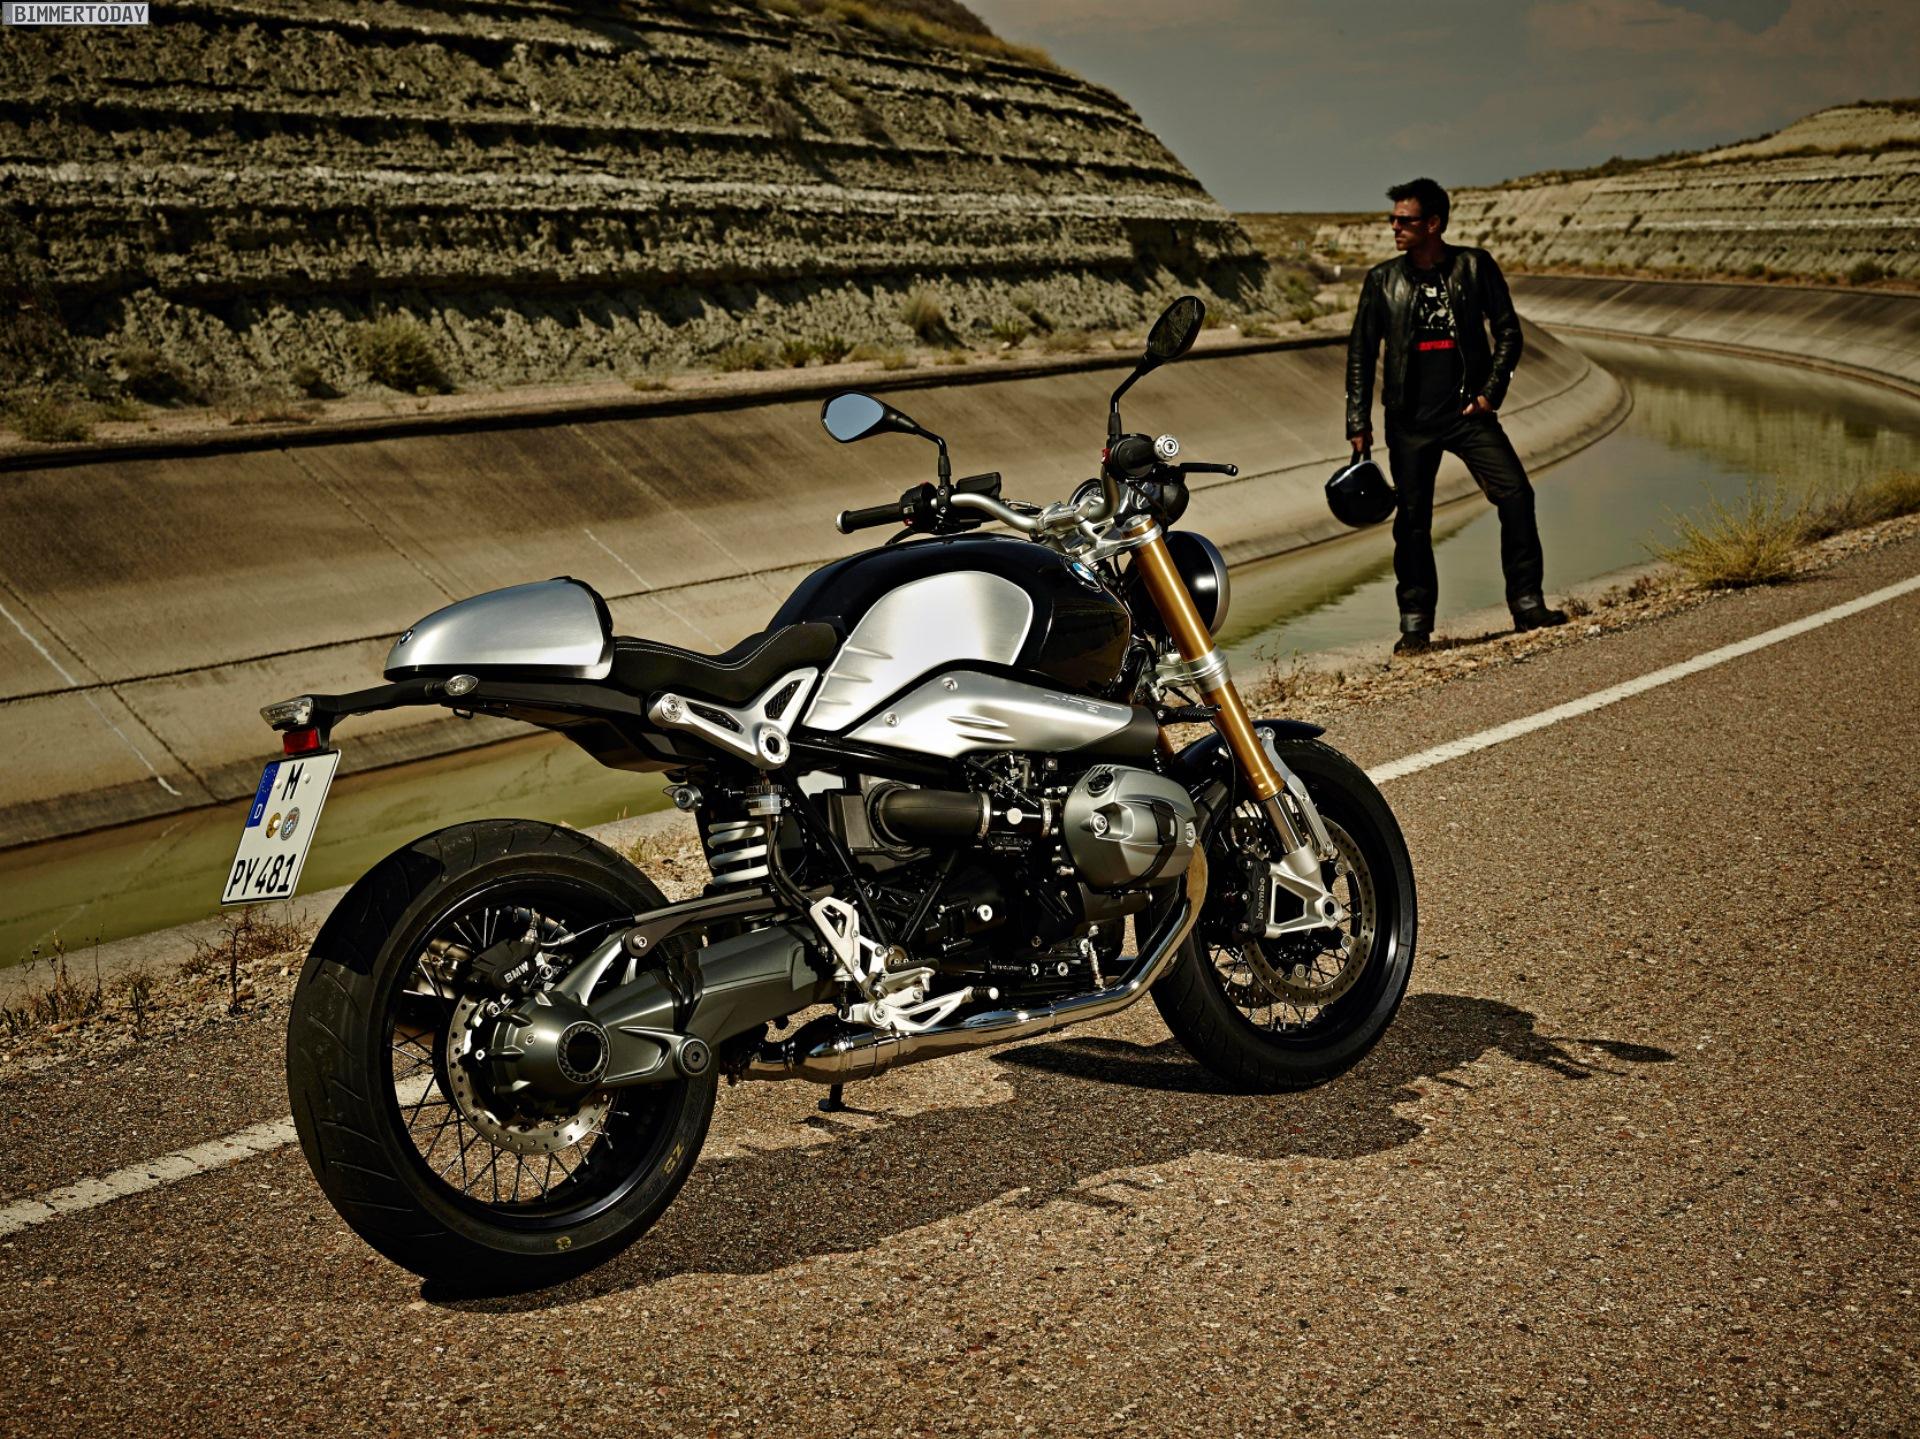 Bmw R Ninet Bmw Motorrad Baut Jubil 228 Umsmodell Zum 90 Geburtstag